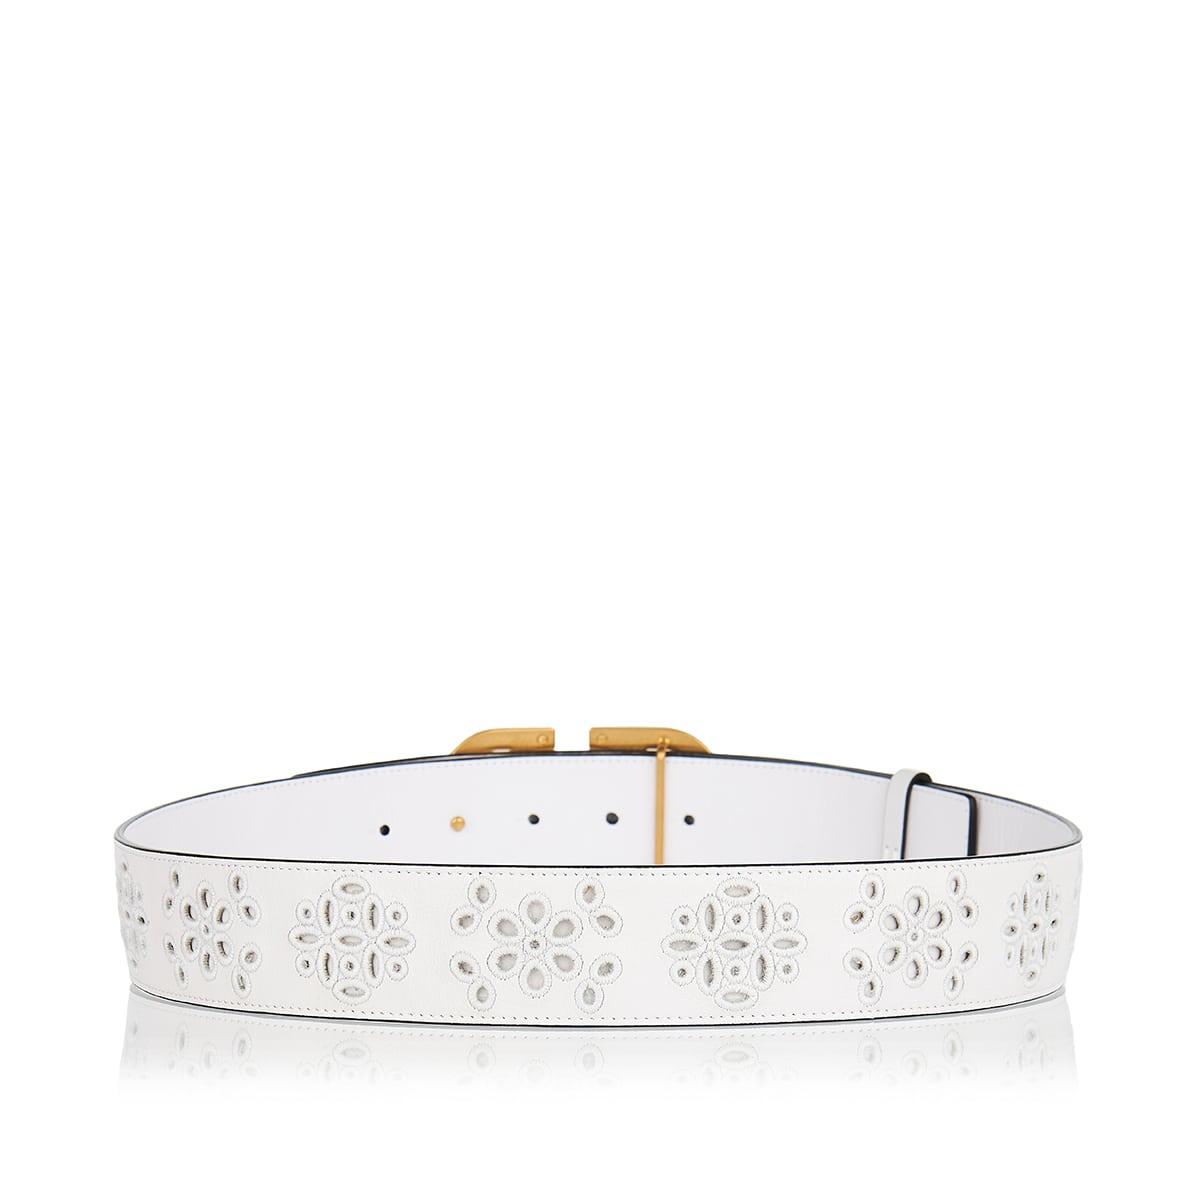 San Gallo Vlogo leather belt